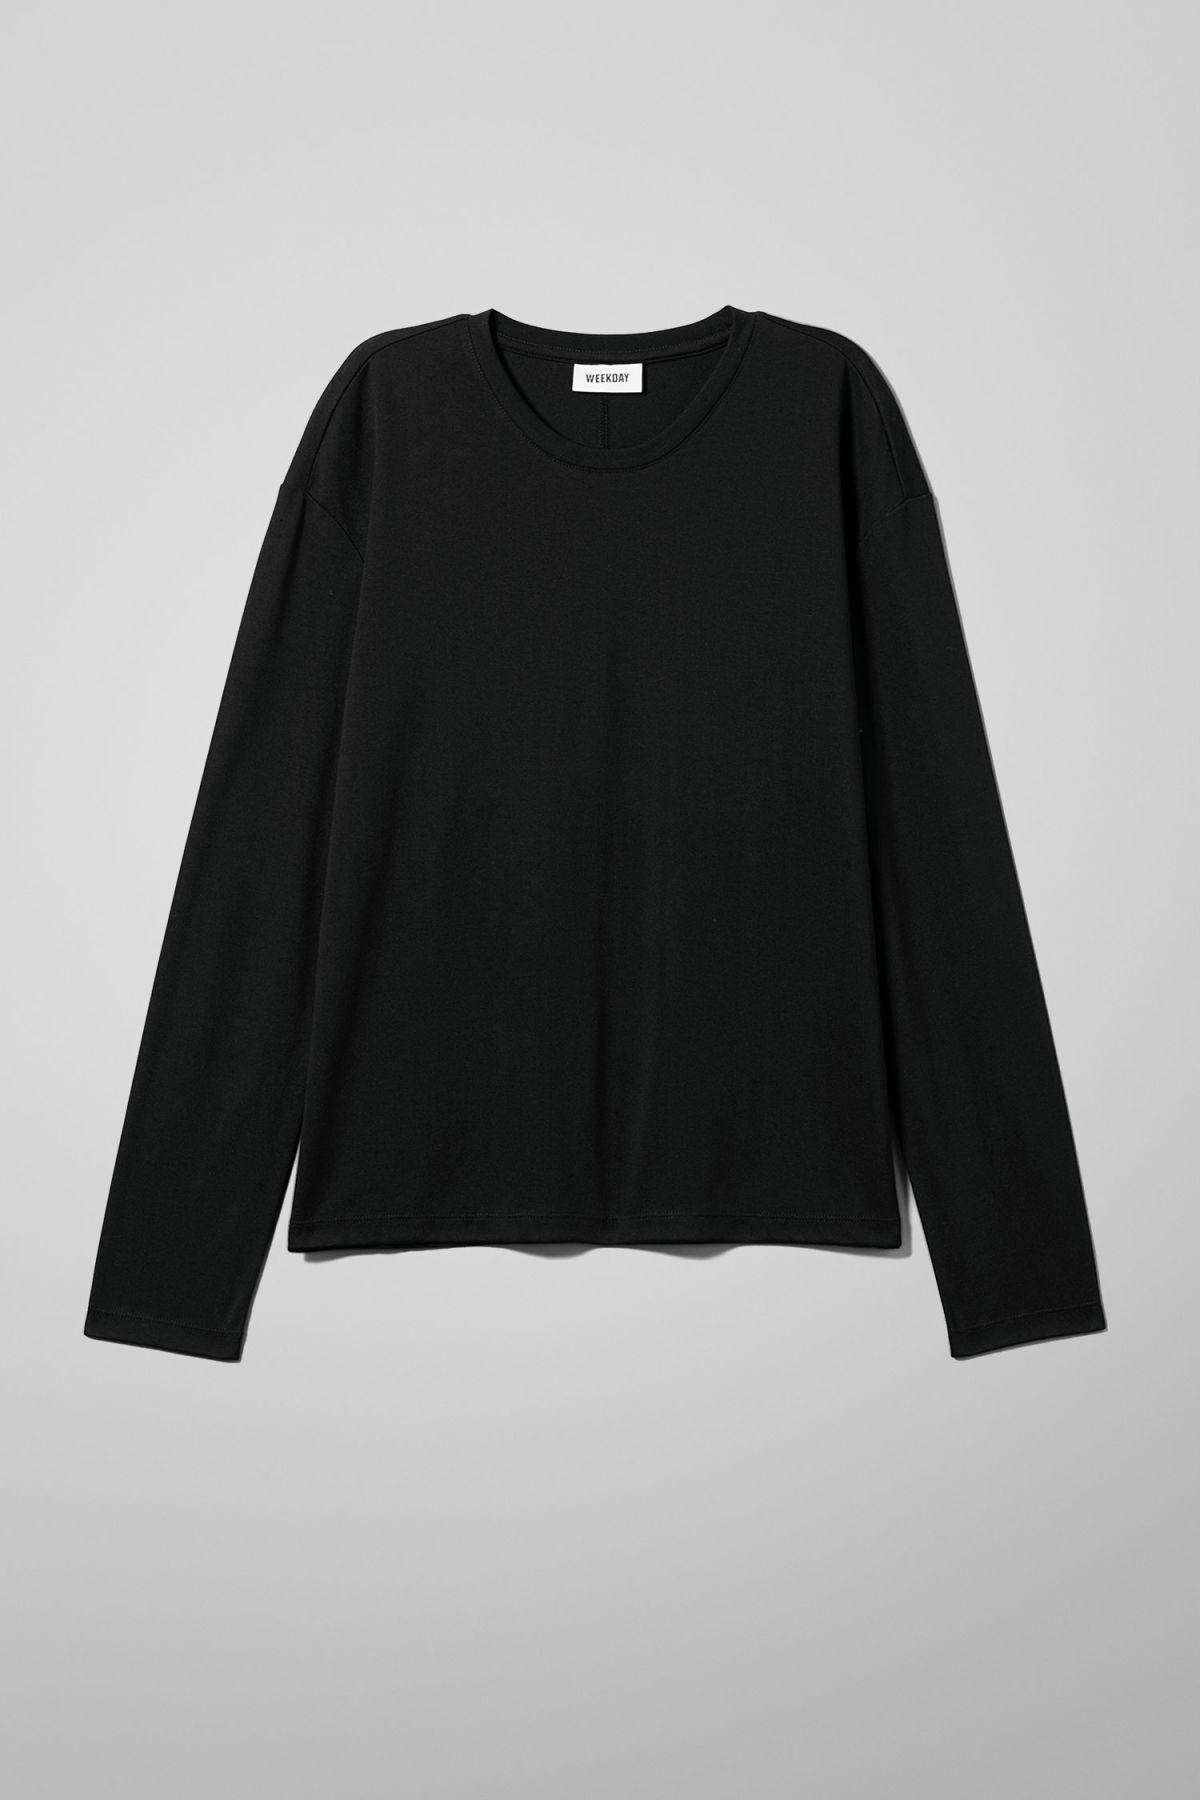 Image of Grace Long Sleeve - Black-XS